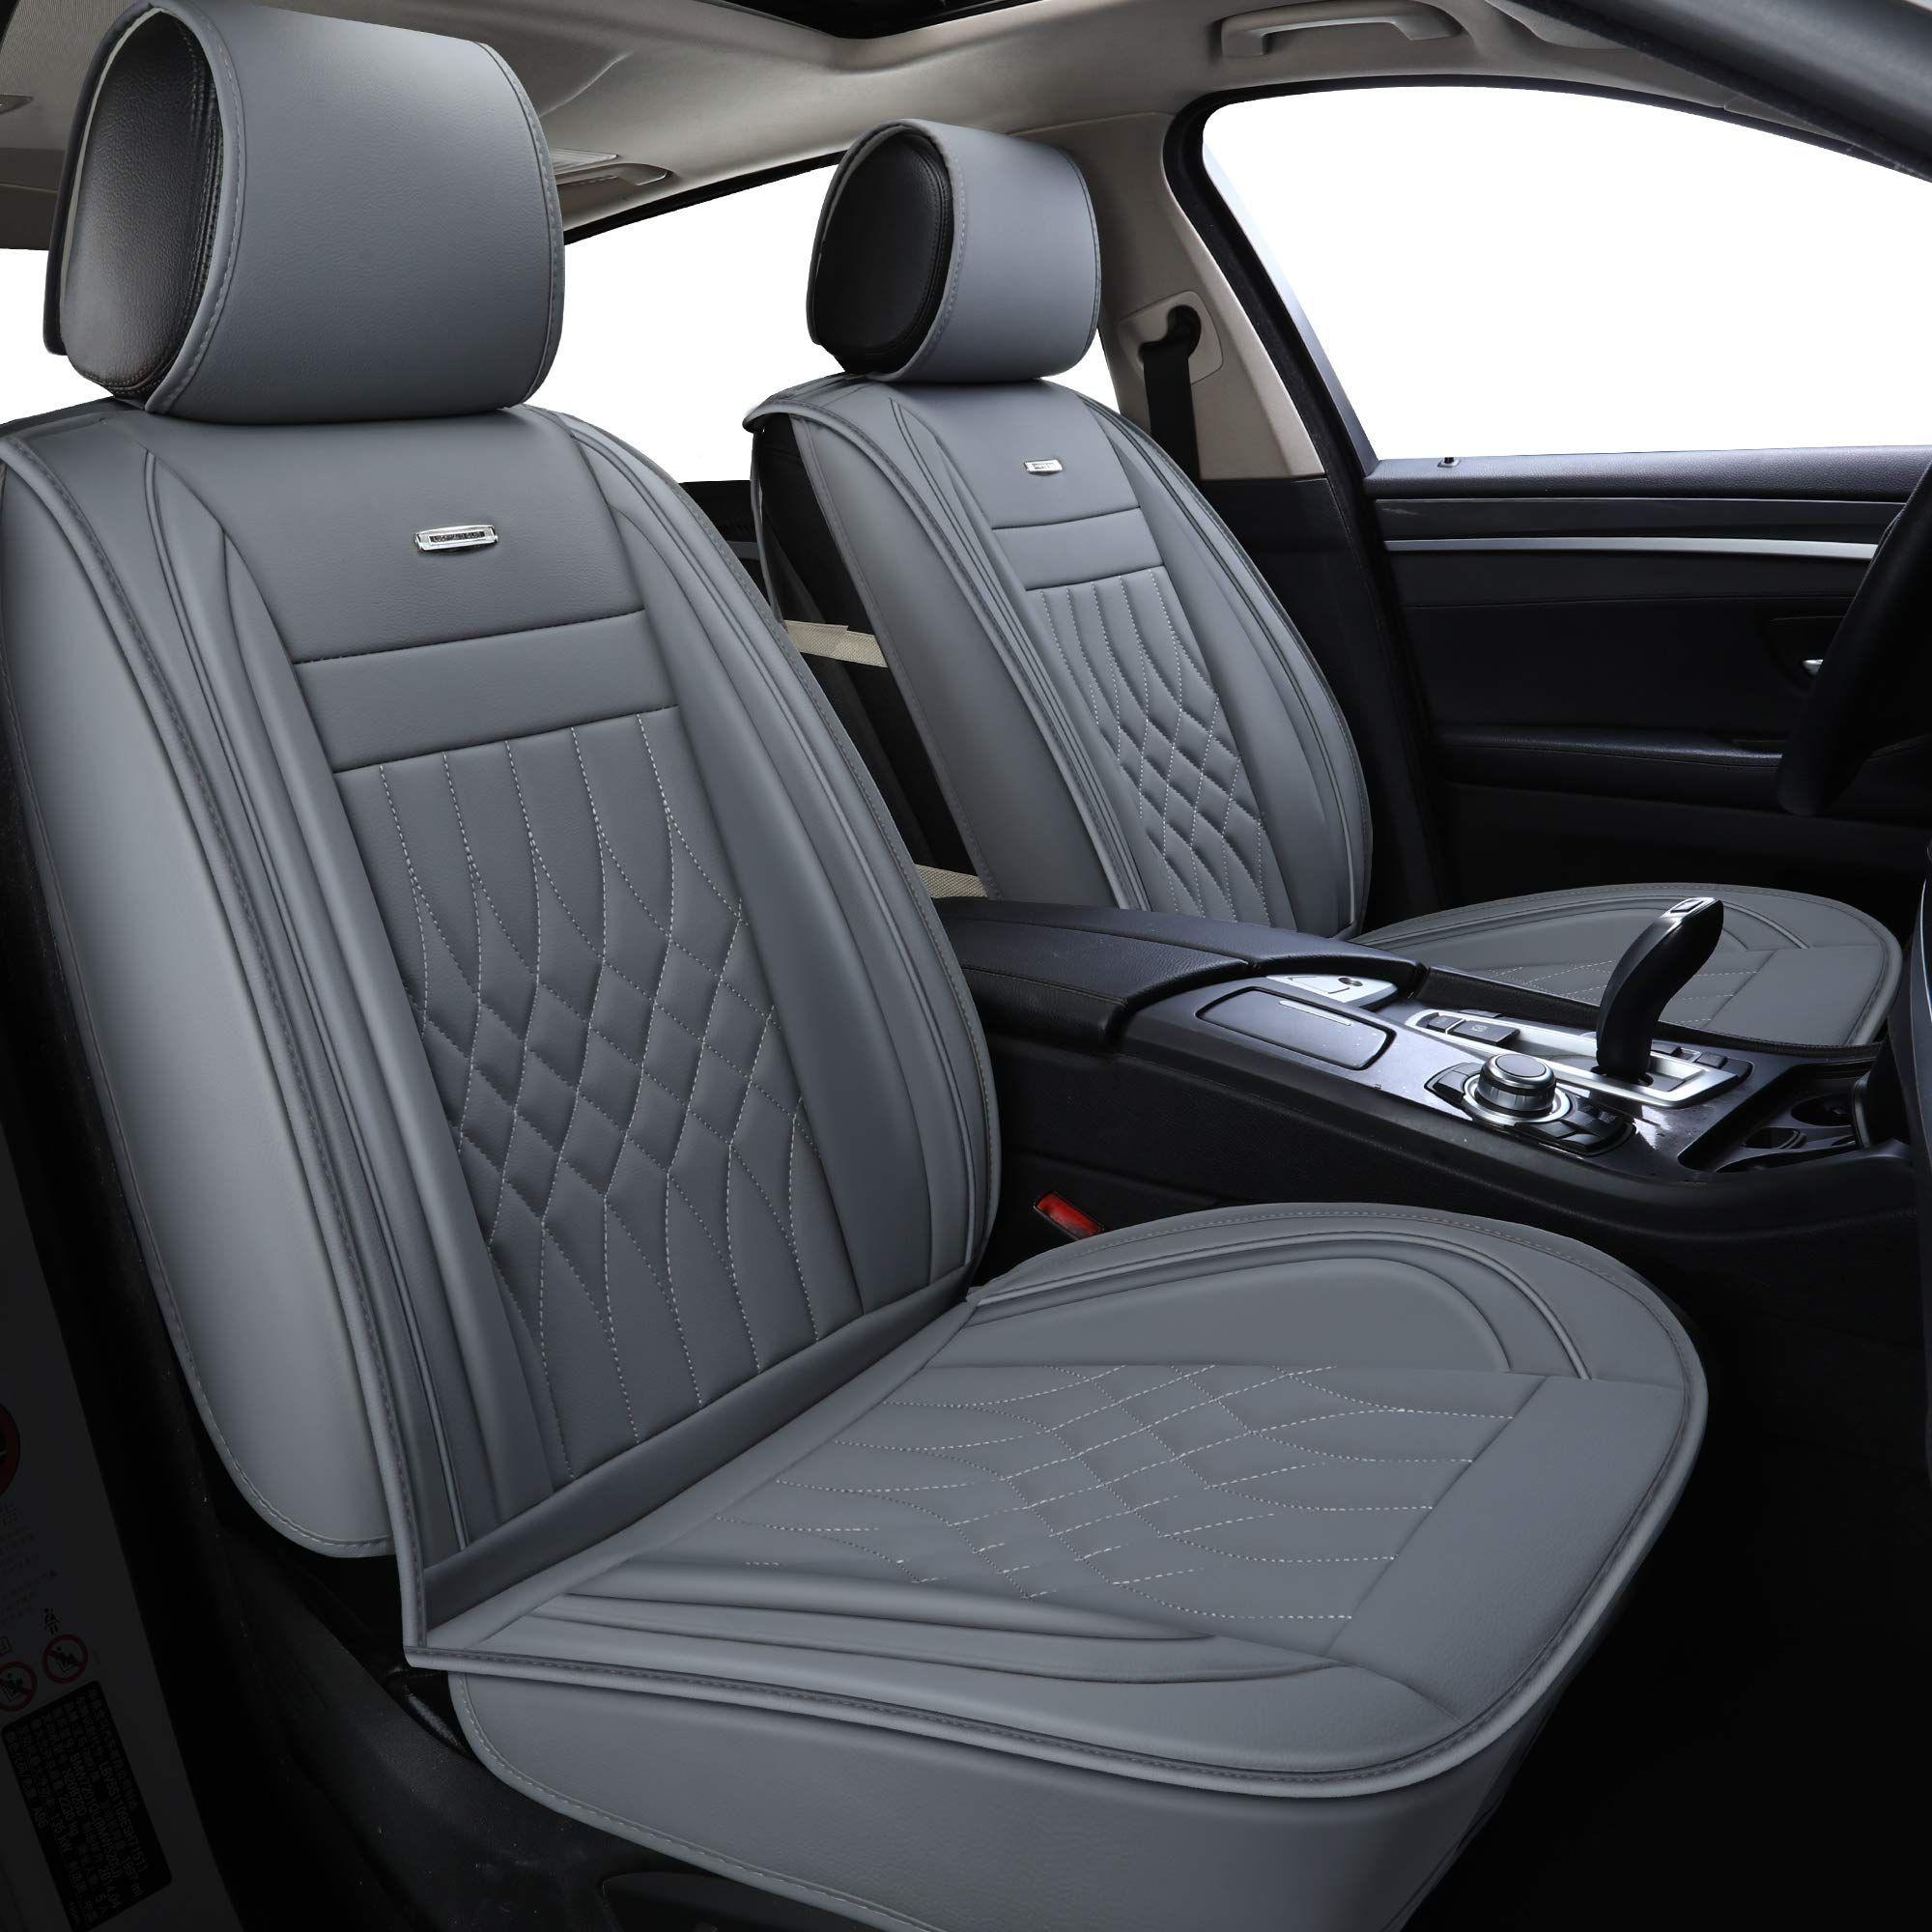 Car seat covers fit Subaru Outback black  leatherette full set